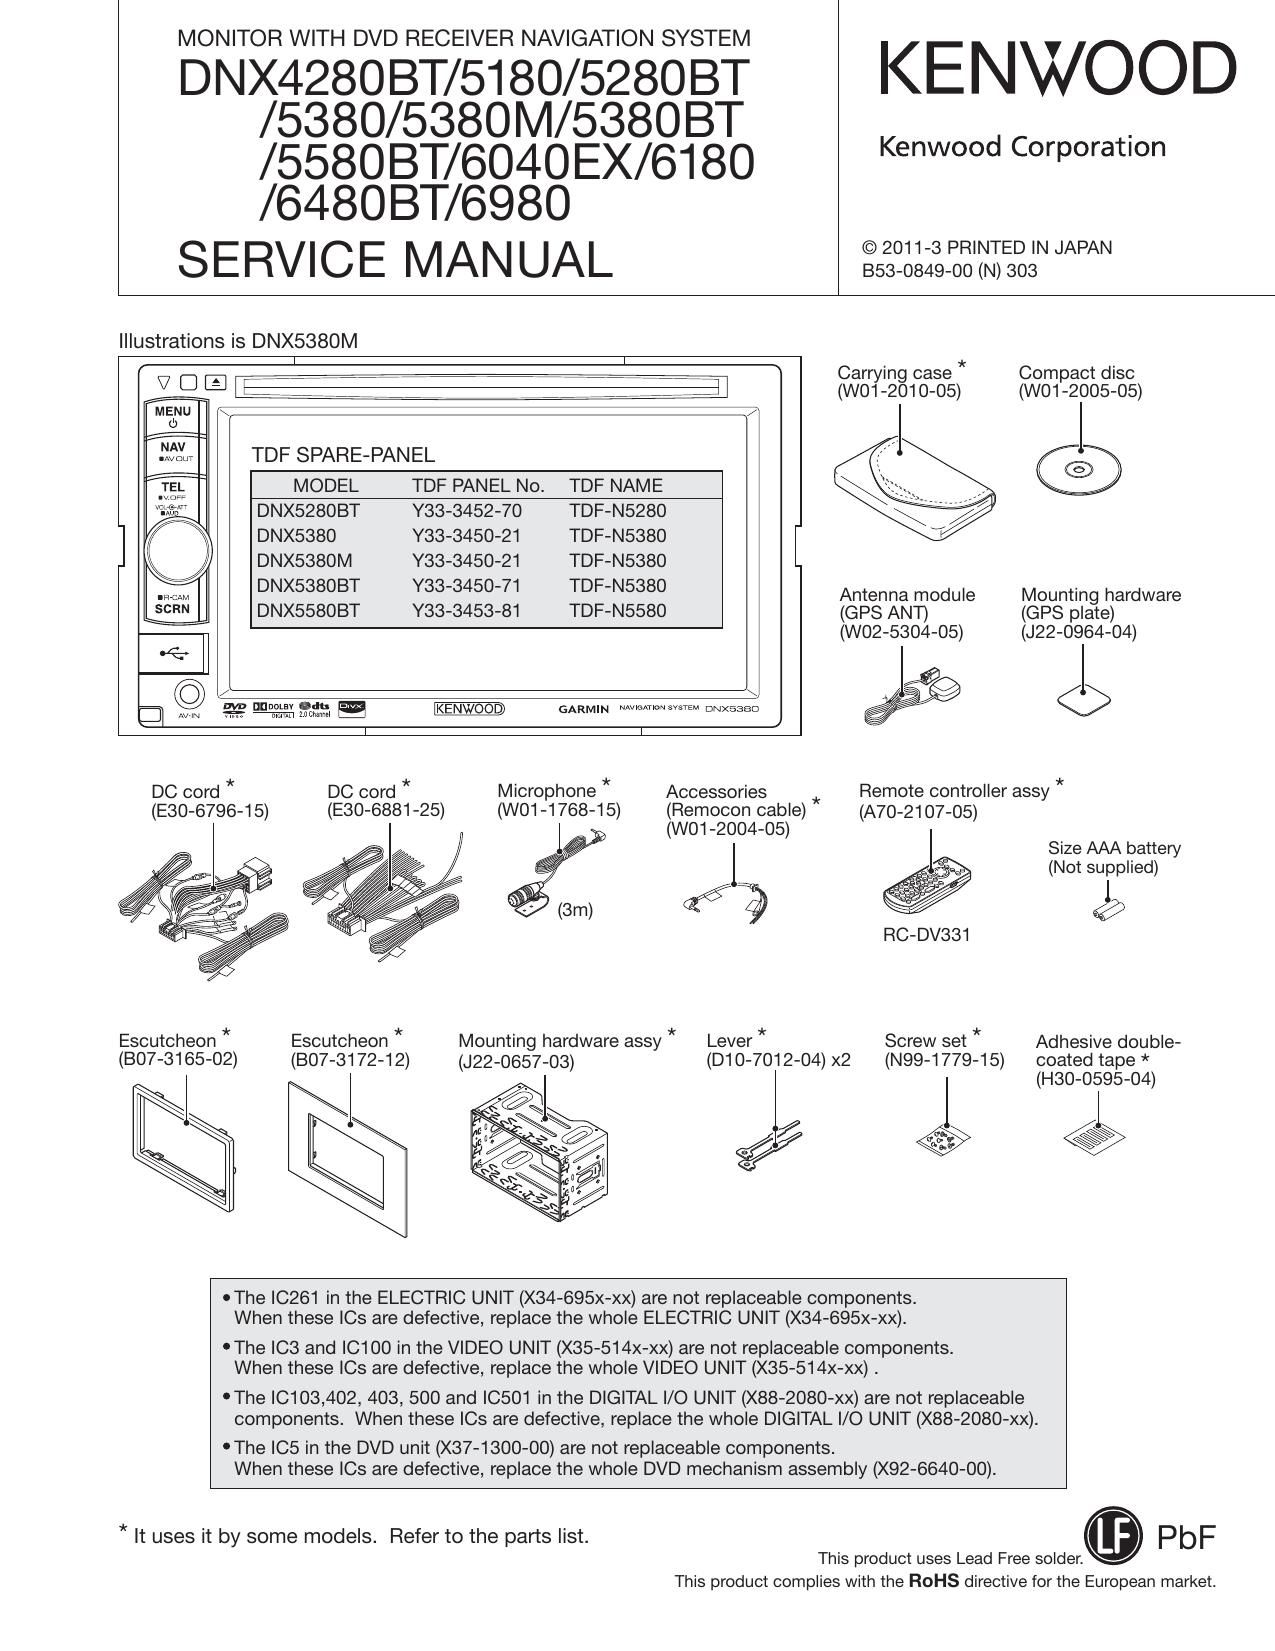 kenwood dnx 6980 service manual rh audioservicemanuals com Kenwood Manuals DNX9960 Kenwood Radior600